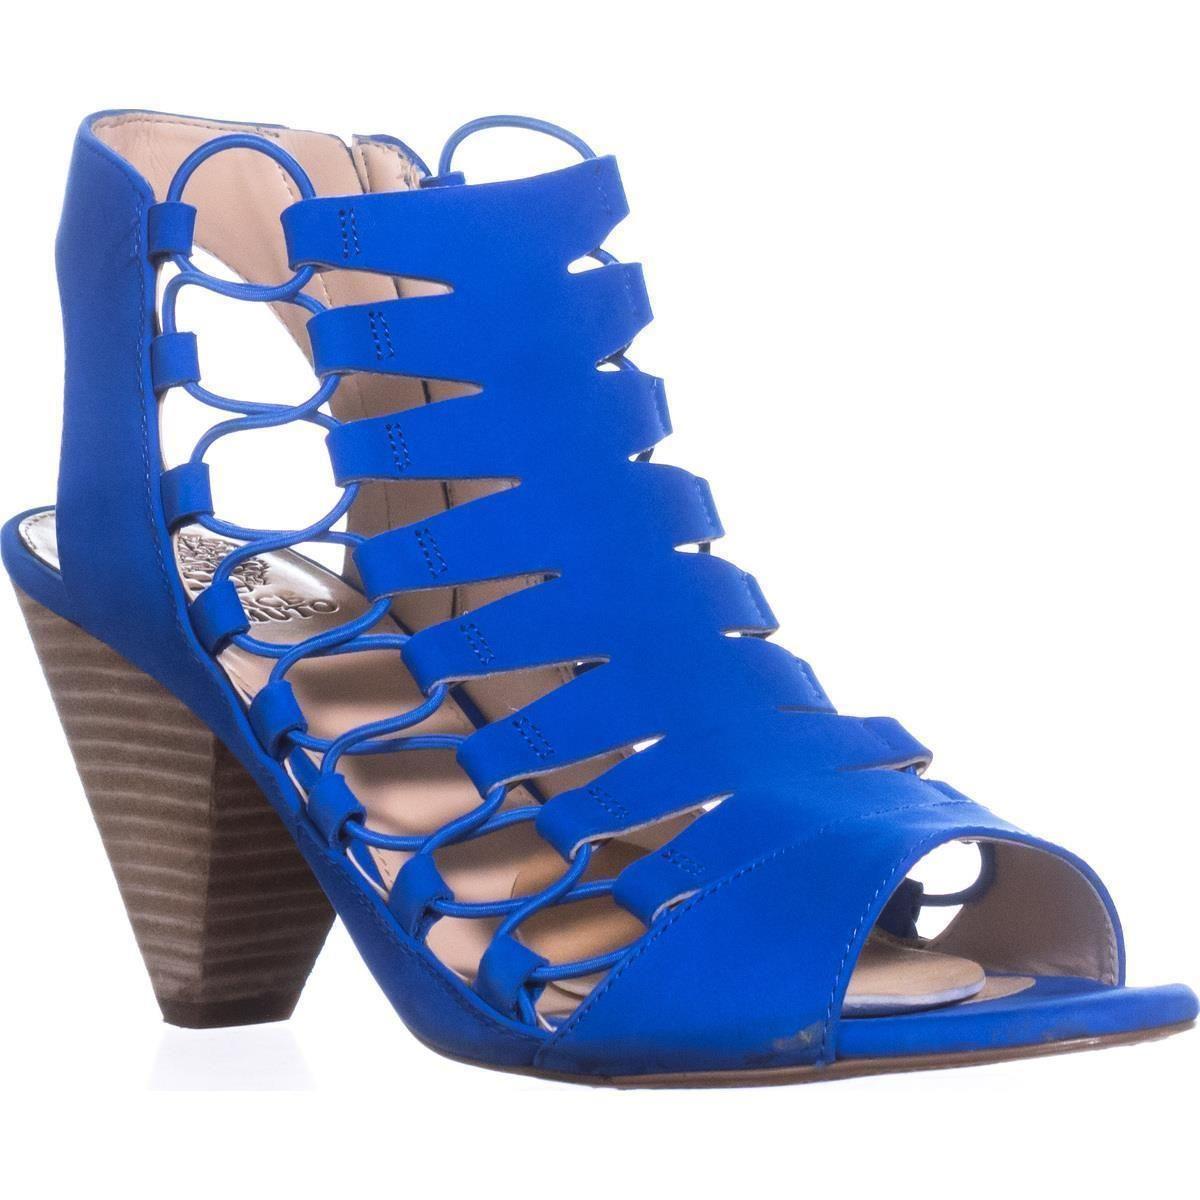 296660c30b0 Lyst - Vince Camuto Eliaz Strappy Dress Sandals in Blue